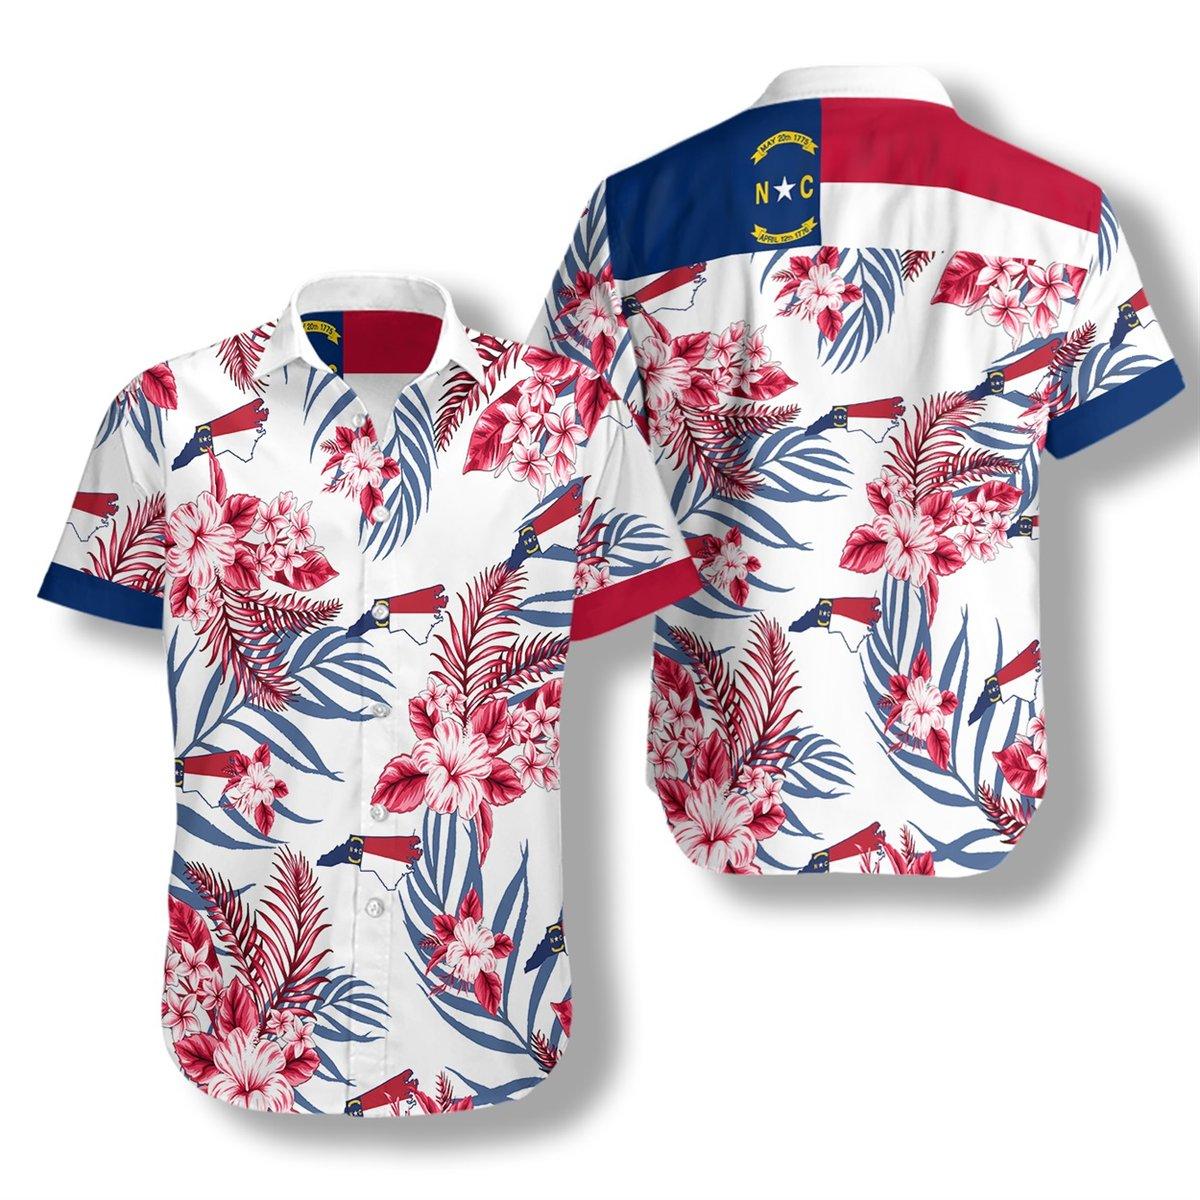 TOP HAWAIIAN SHIRT FOR MEN IN JULY 12